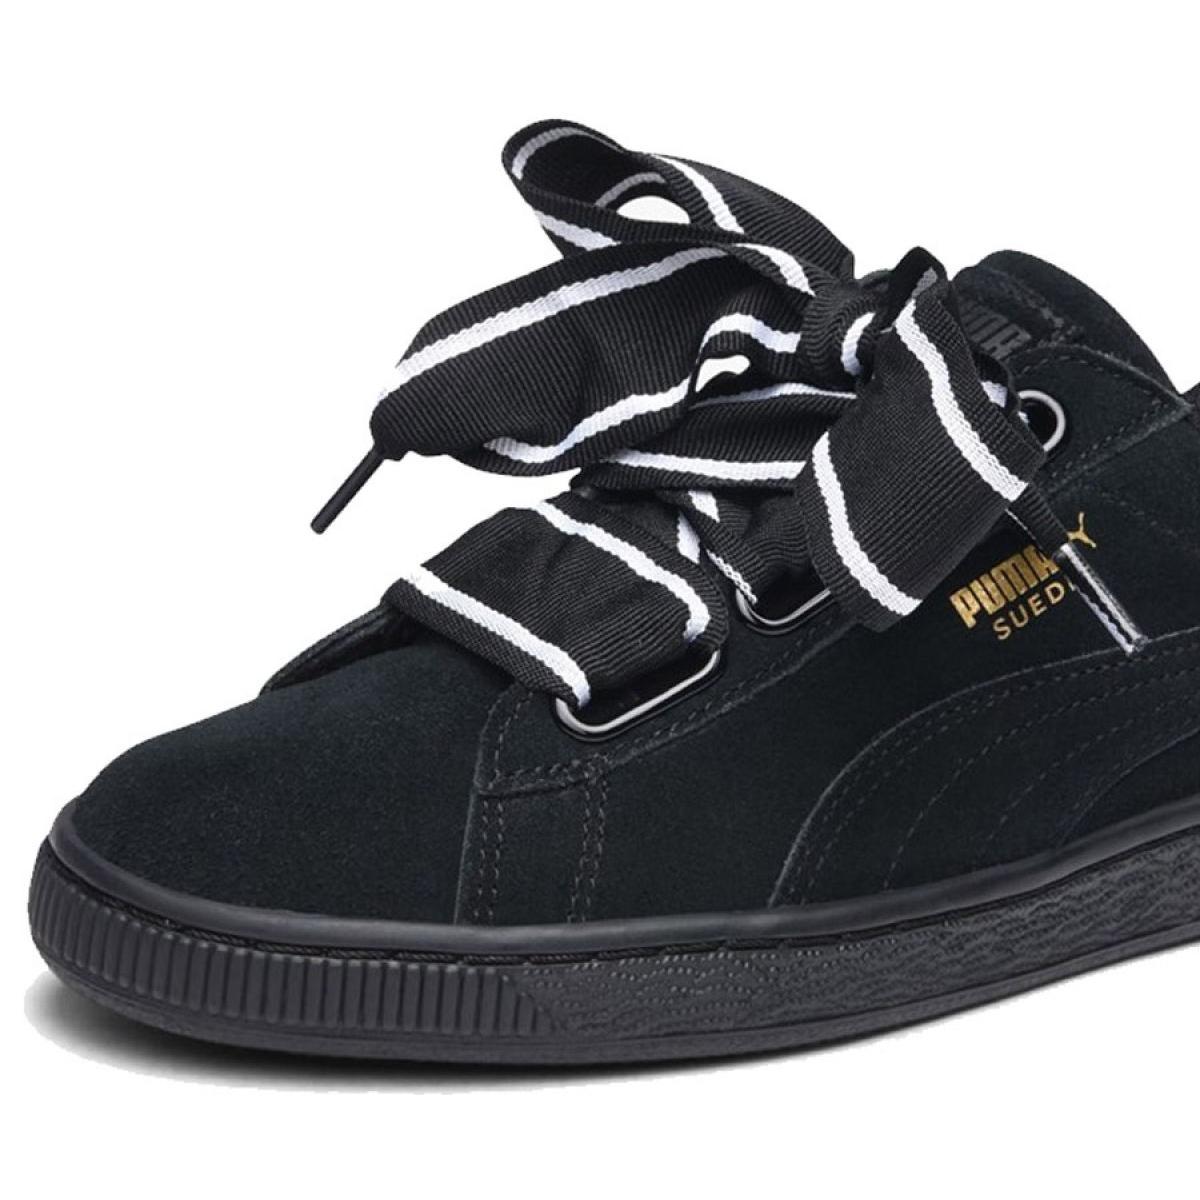 Noir Puma Heart 01 364084 Suede Satin W Chaussures Ii ulJ3KTcF1